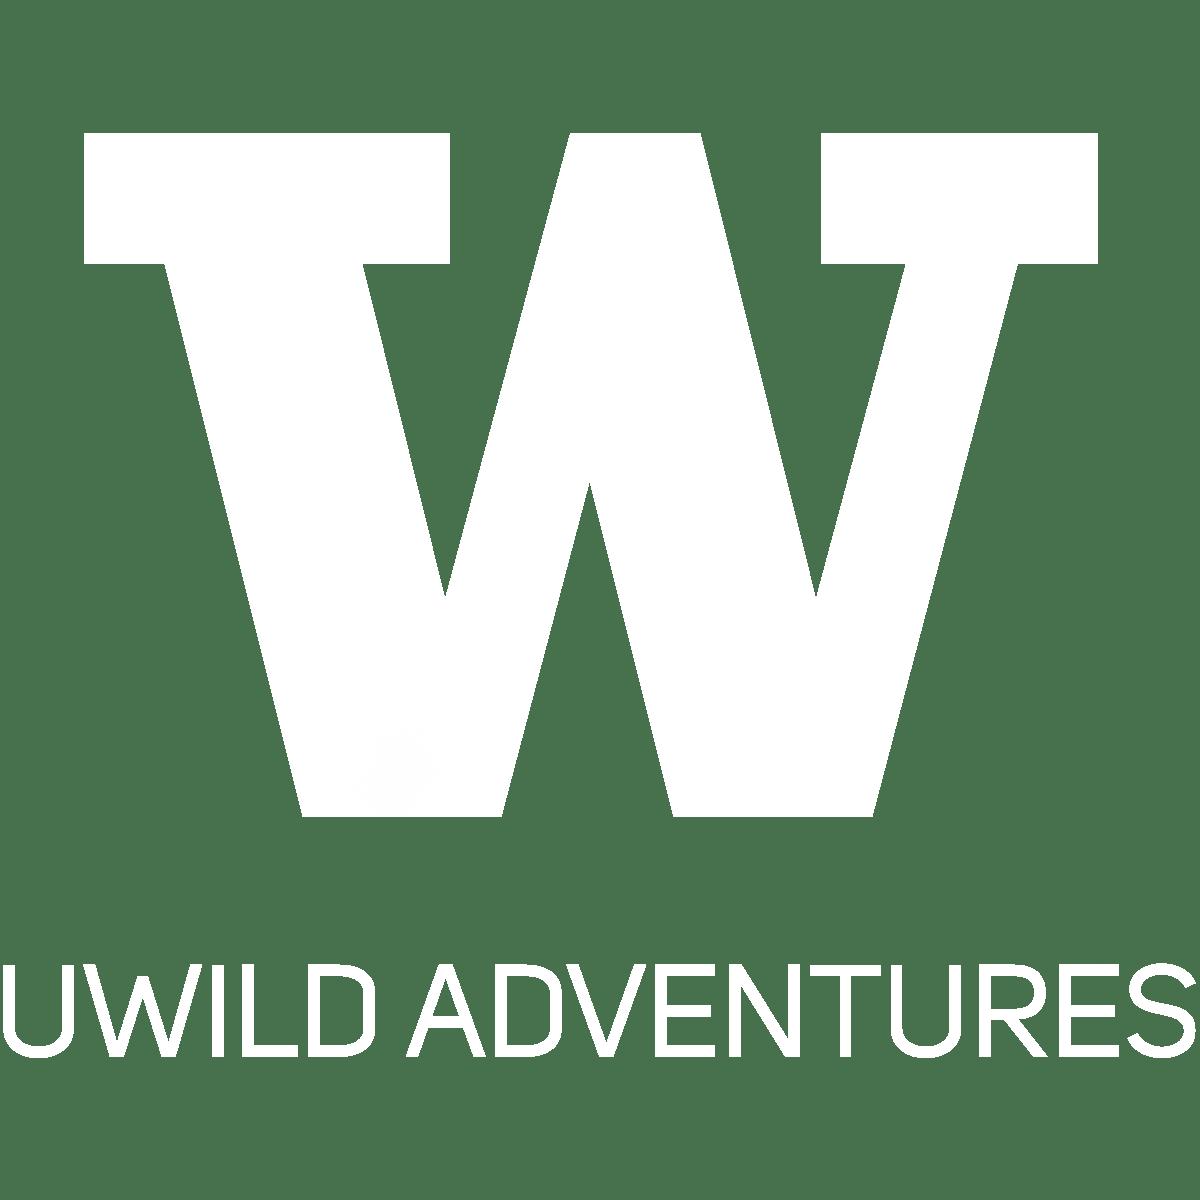 uwild adventures